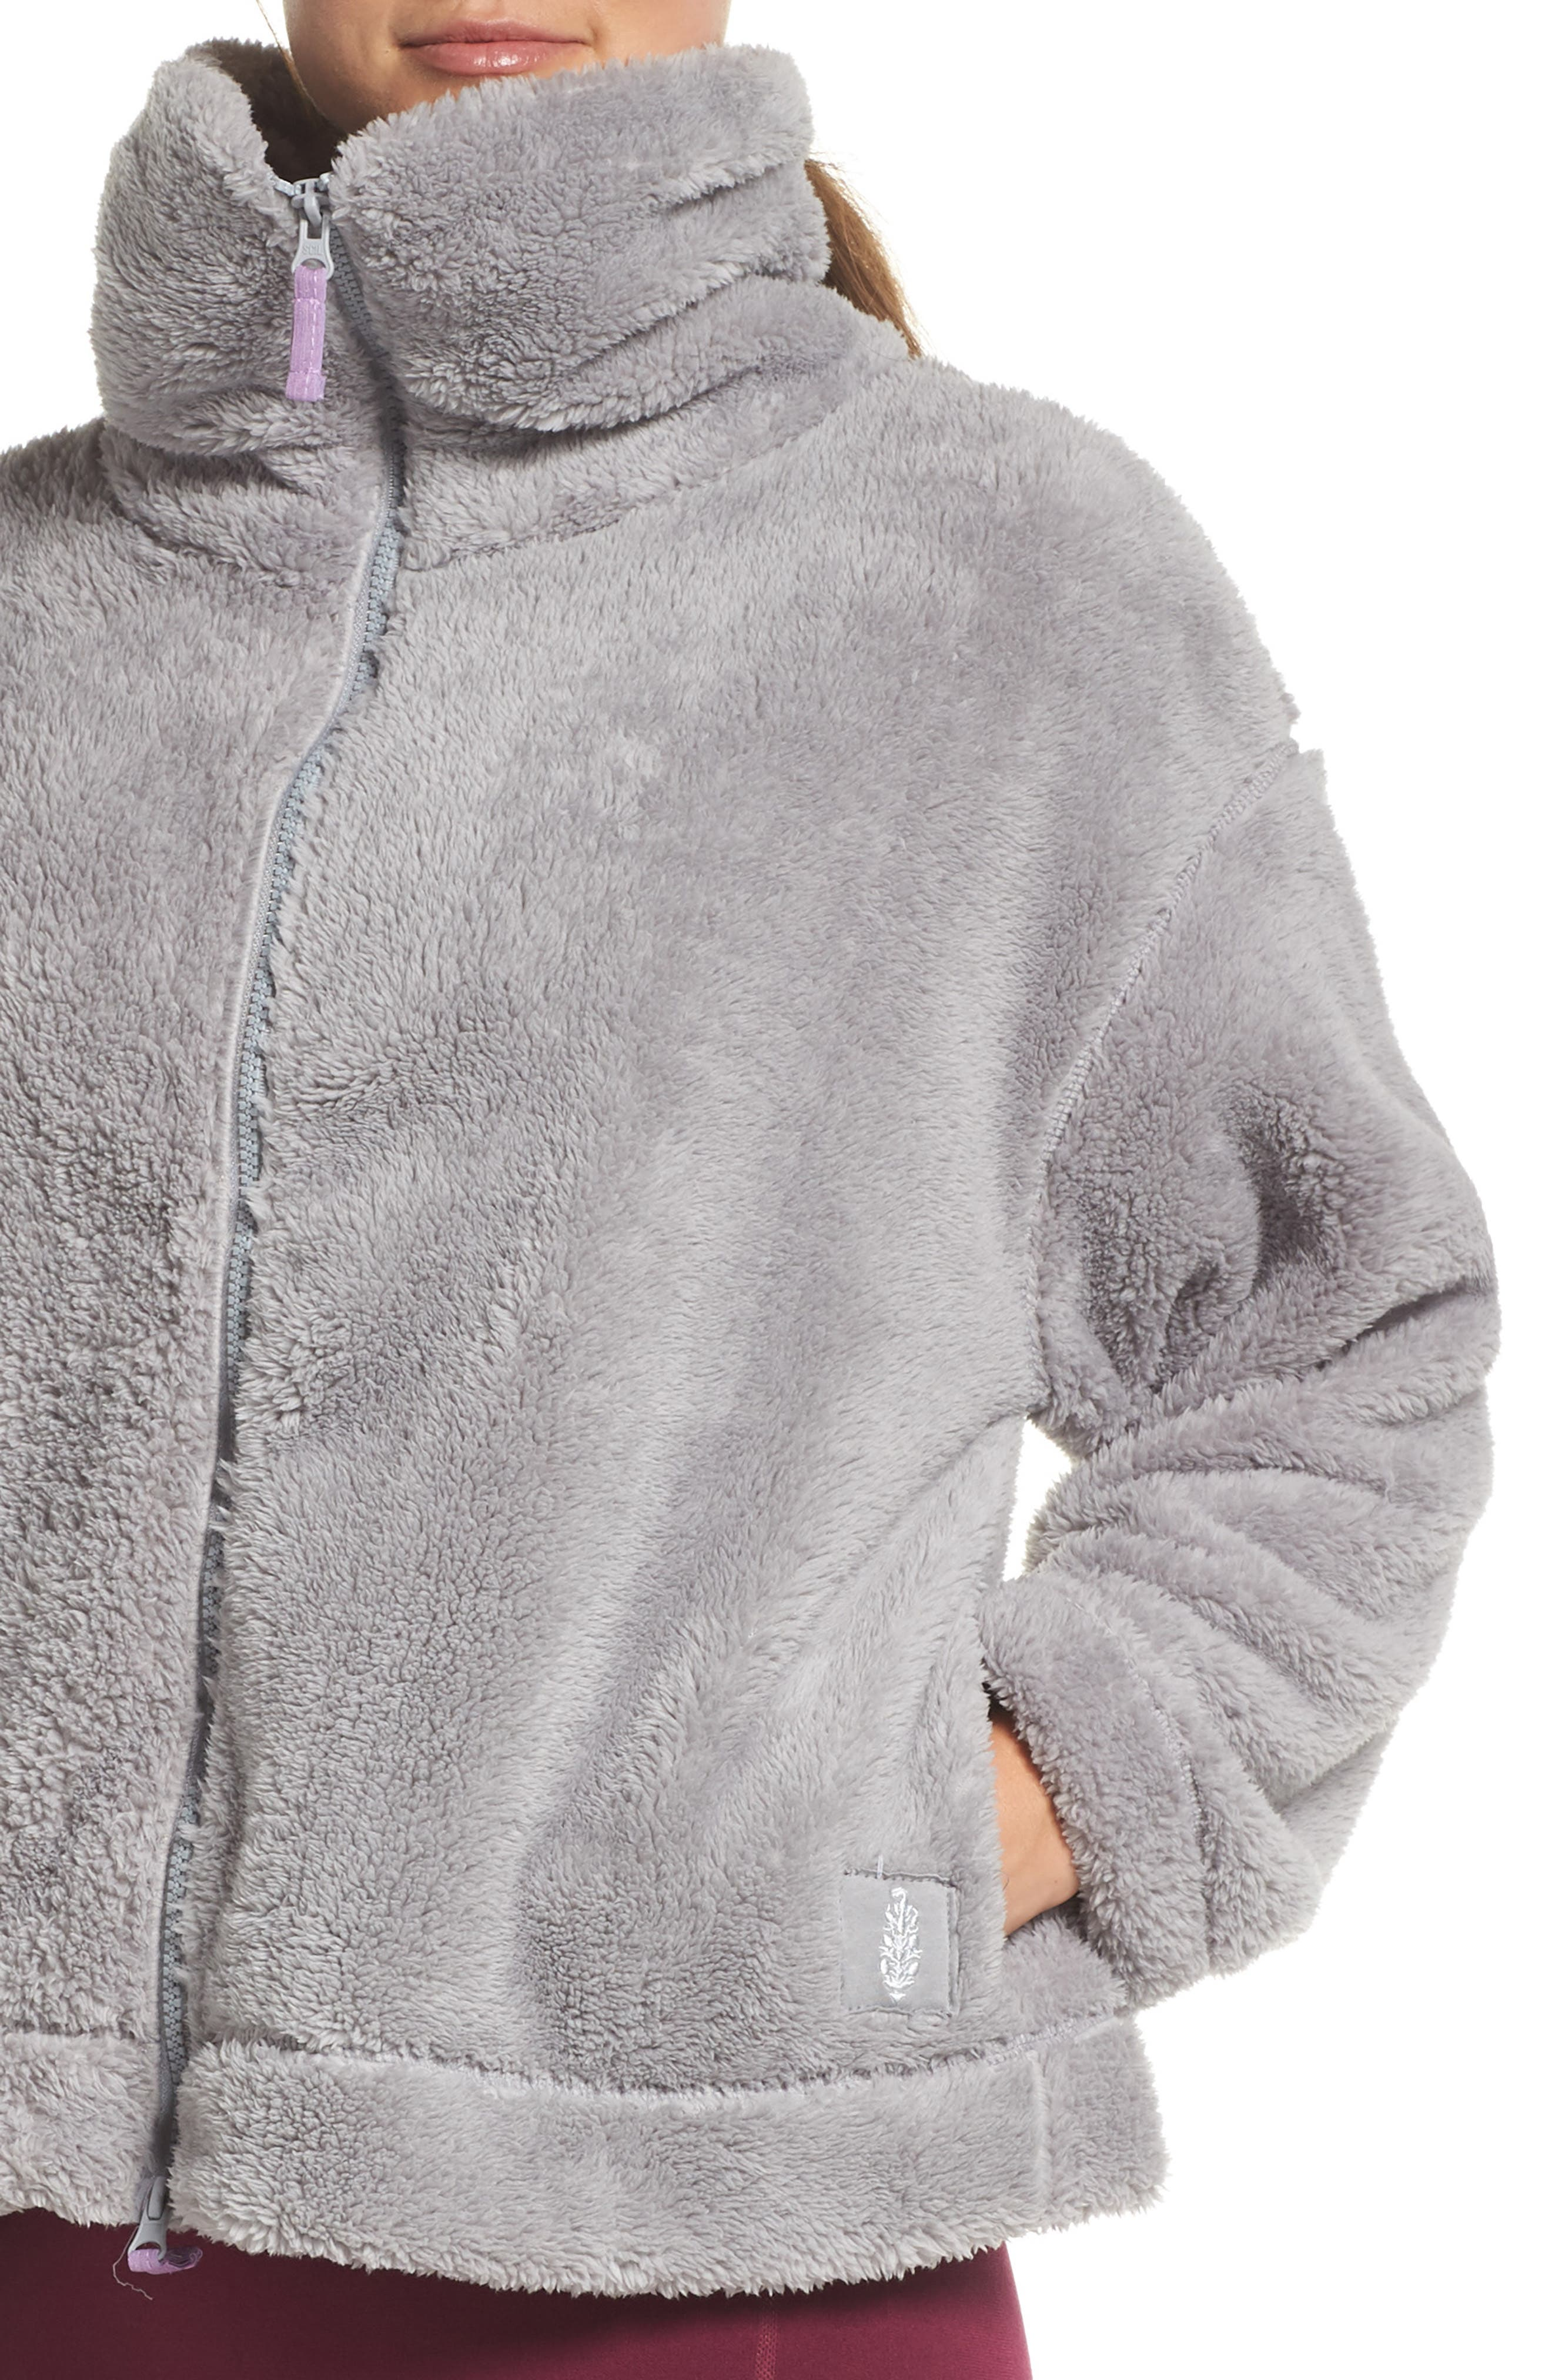 Dazed Fleece Jacket,                             Alternate thumbnail 4, color,                             GREY